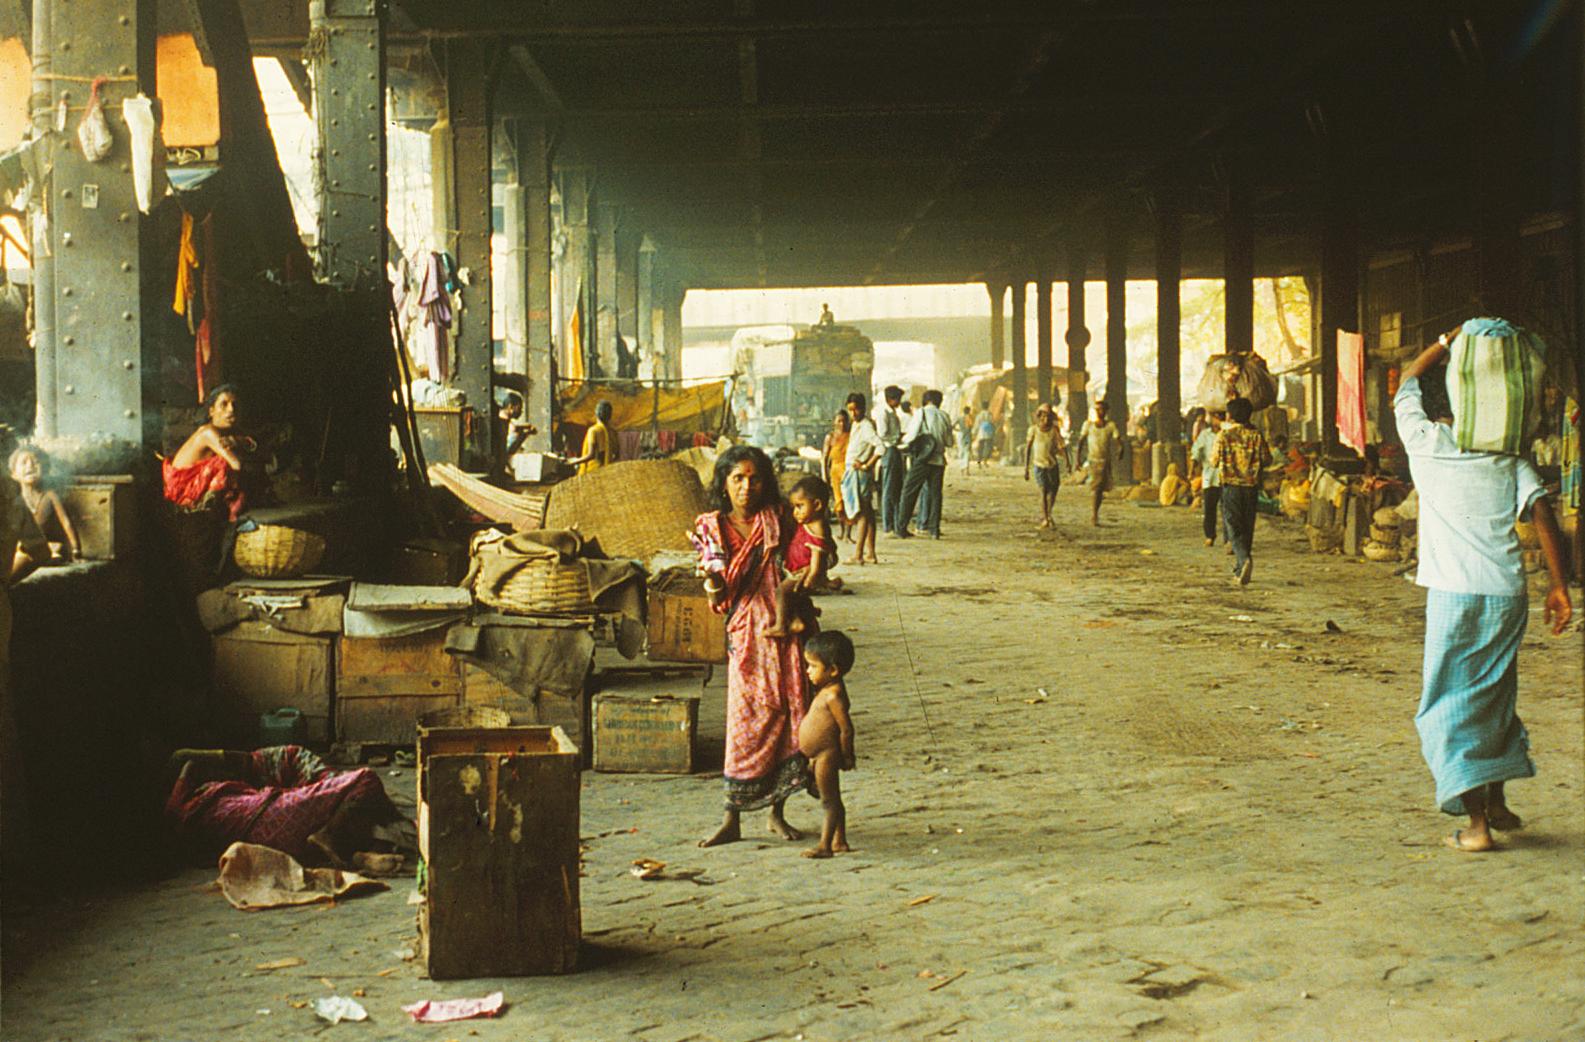 Living-under-the-Calcutta-bridge--1994--LG-(deleted-4db1d9fb-9812ce-9629d54f).jpg